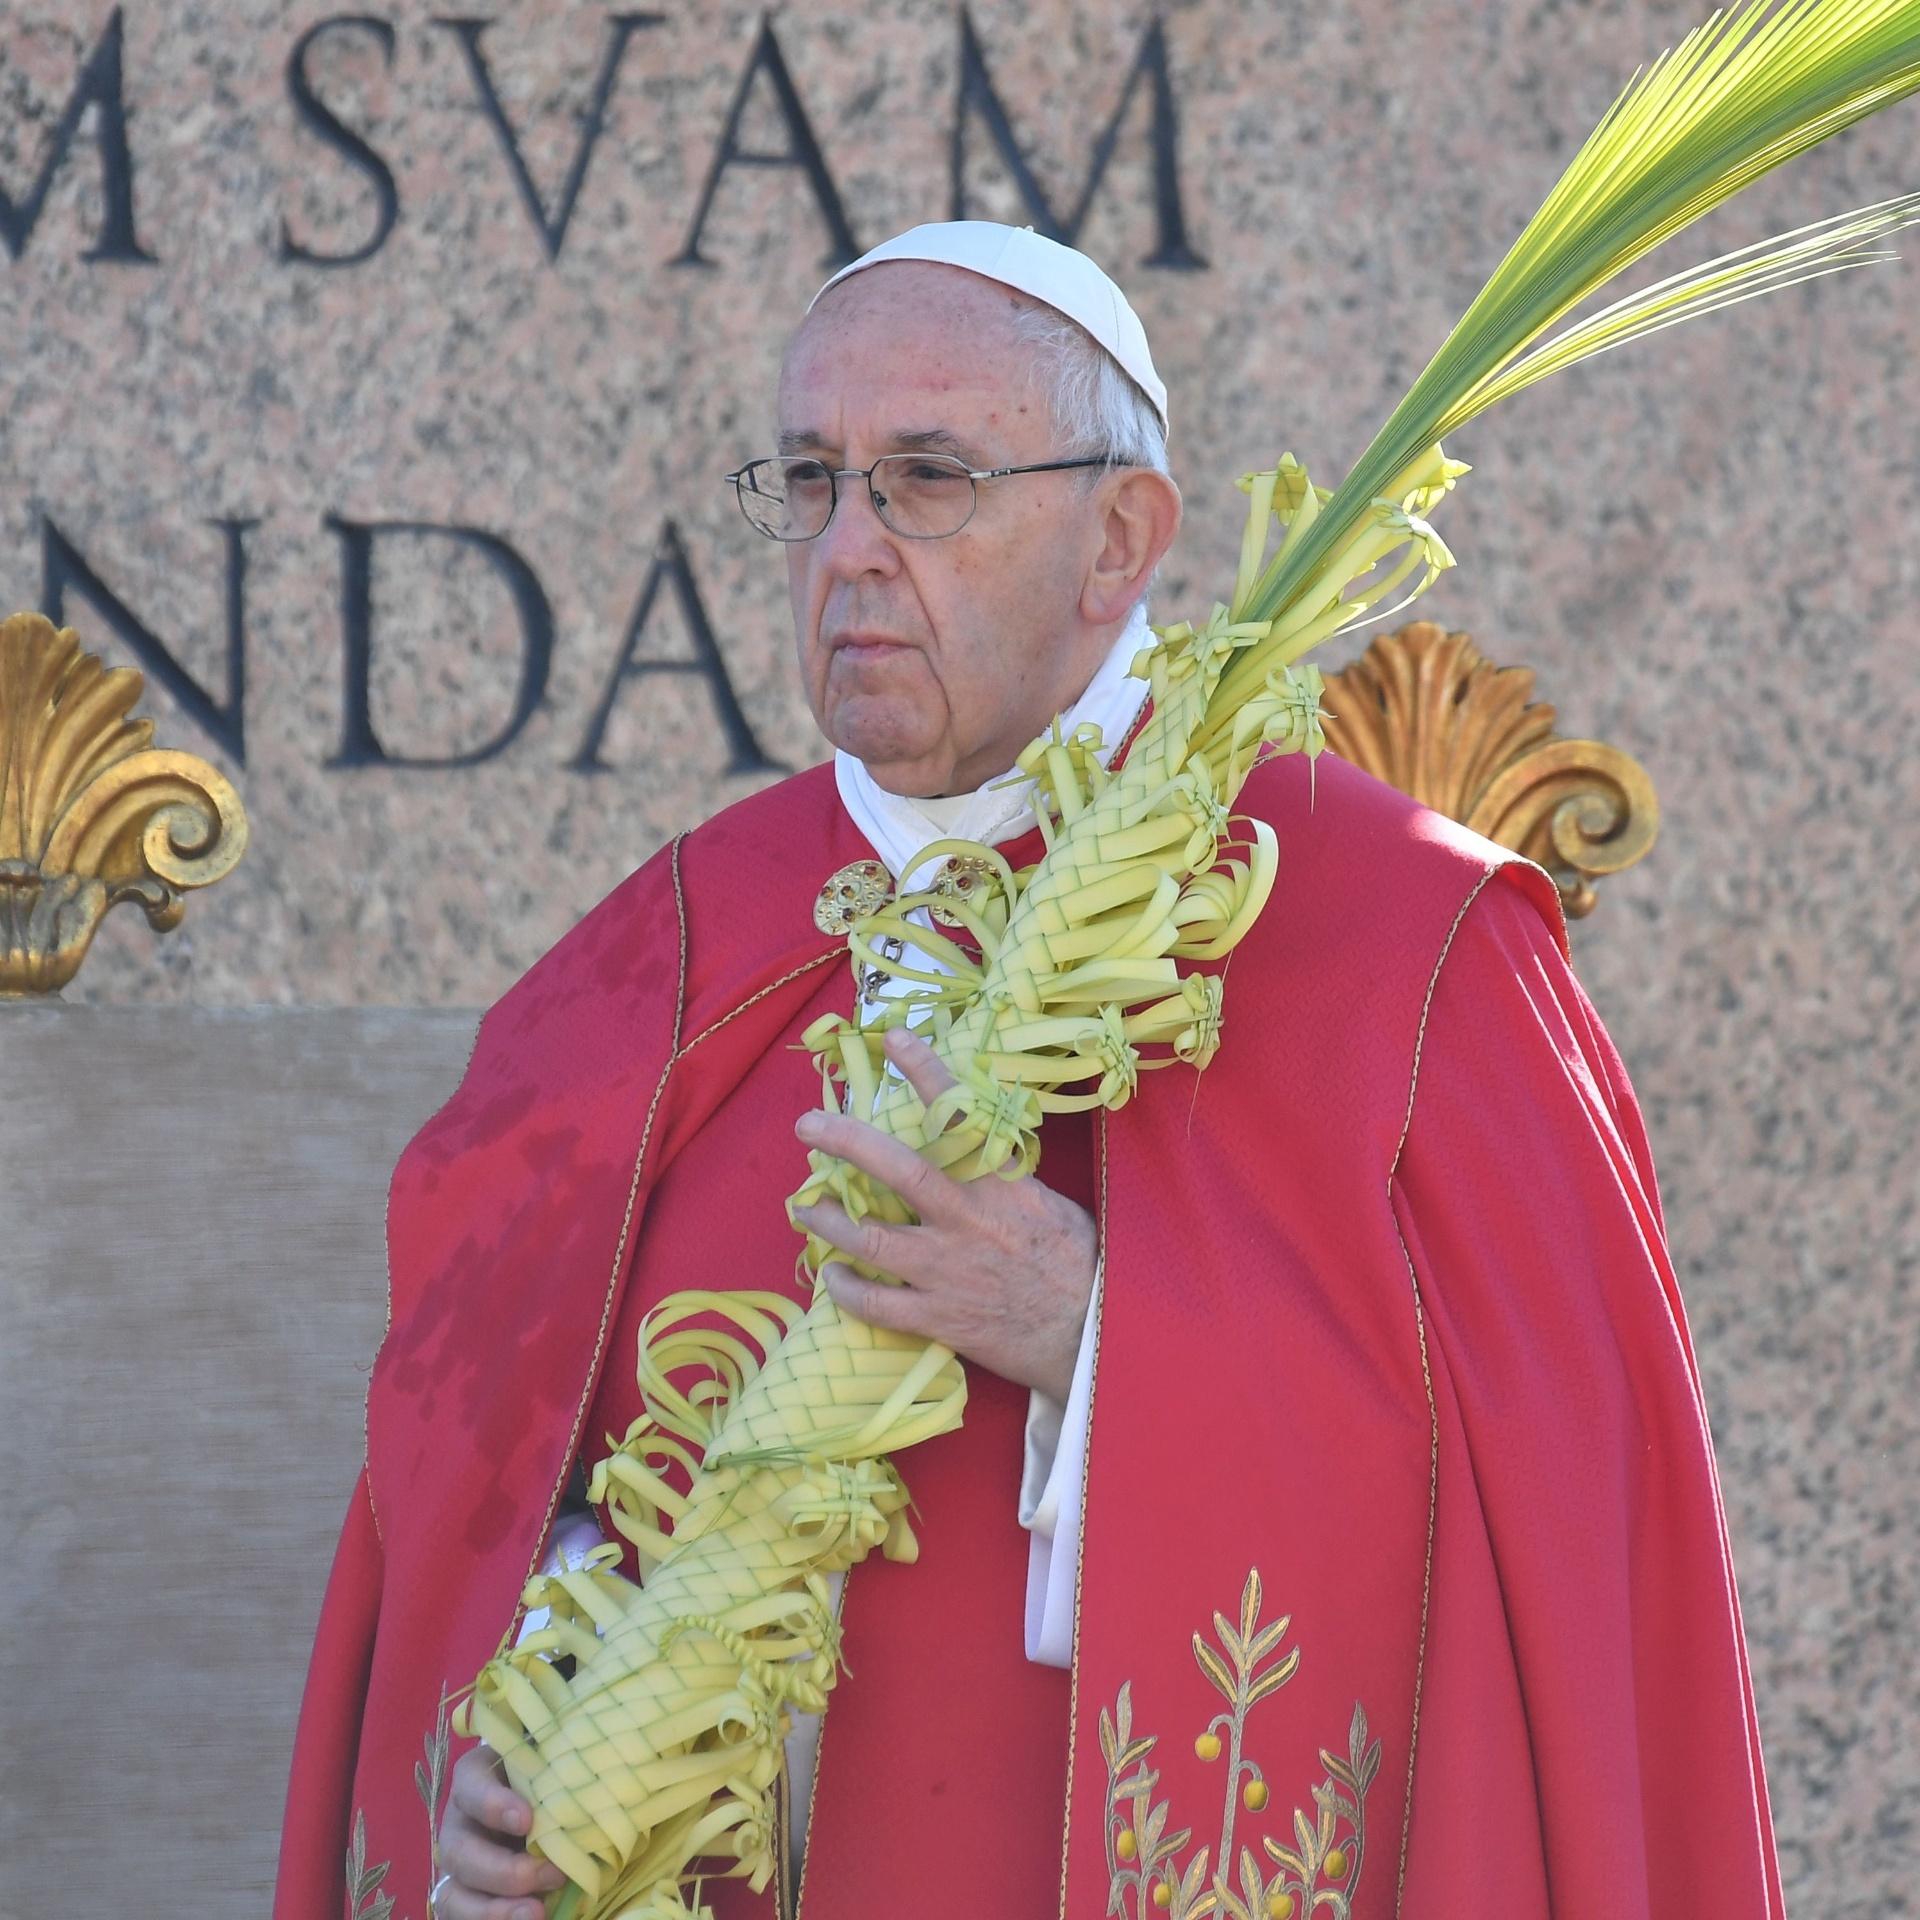 9.abr.2017 - O papa Francisco celebra no Vaticano a missa do Domingo de Ramos, que abre a Semana Santa